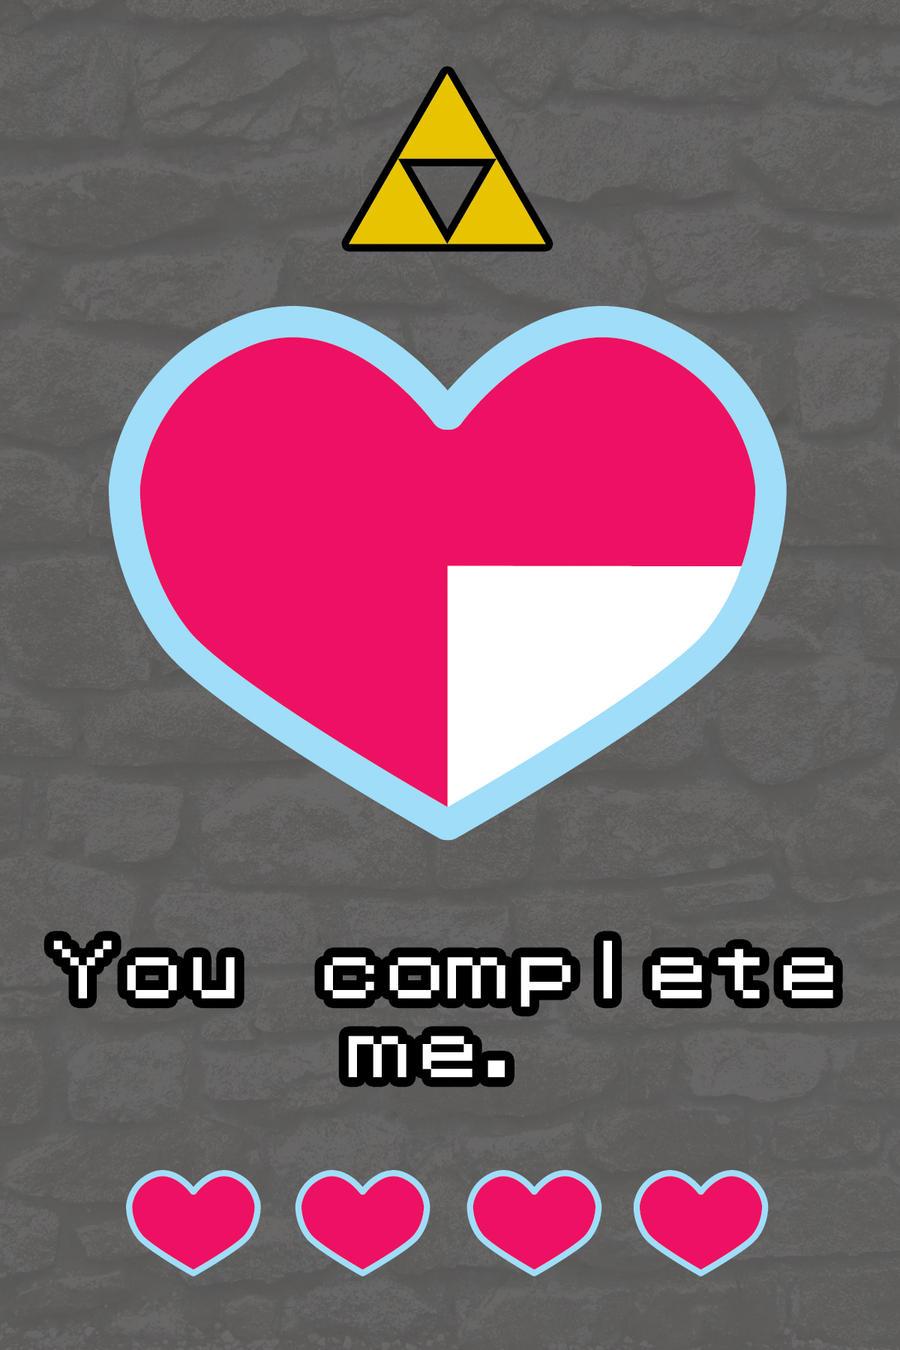 Zelda Valentine Card By Tdj1337 Zelda Valentine Card By Tdj1337